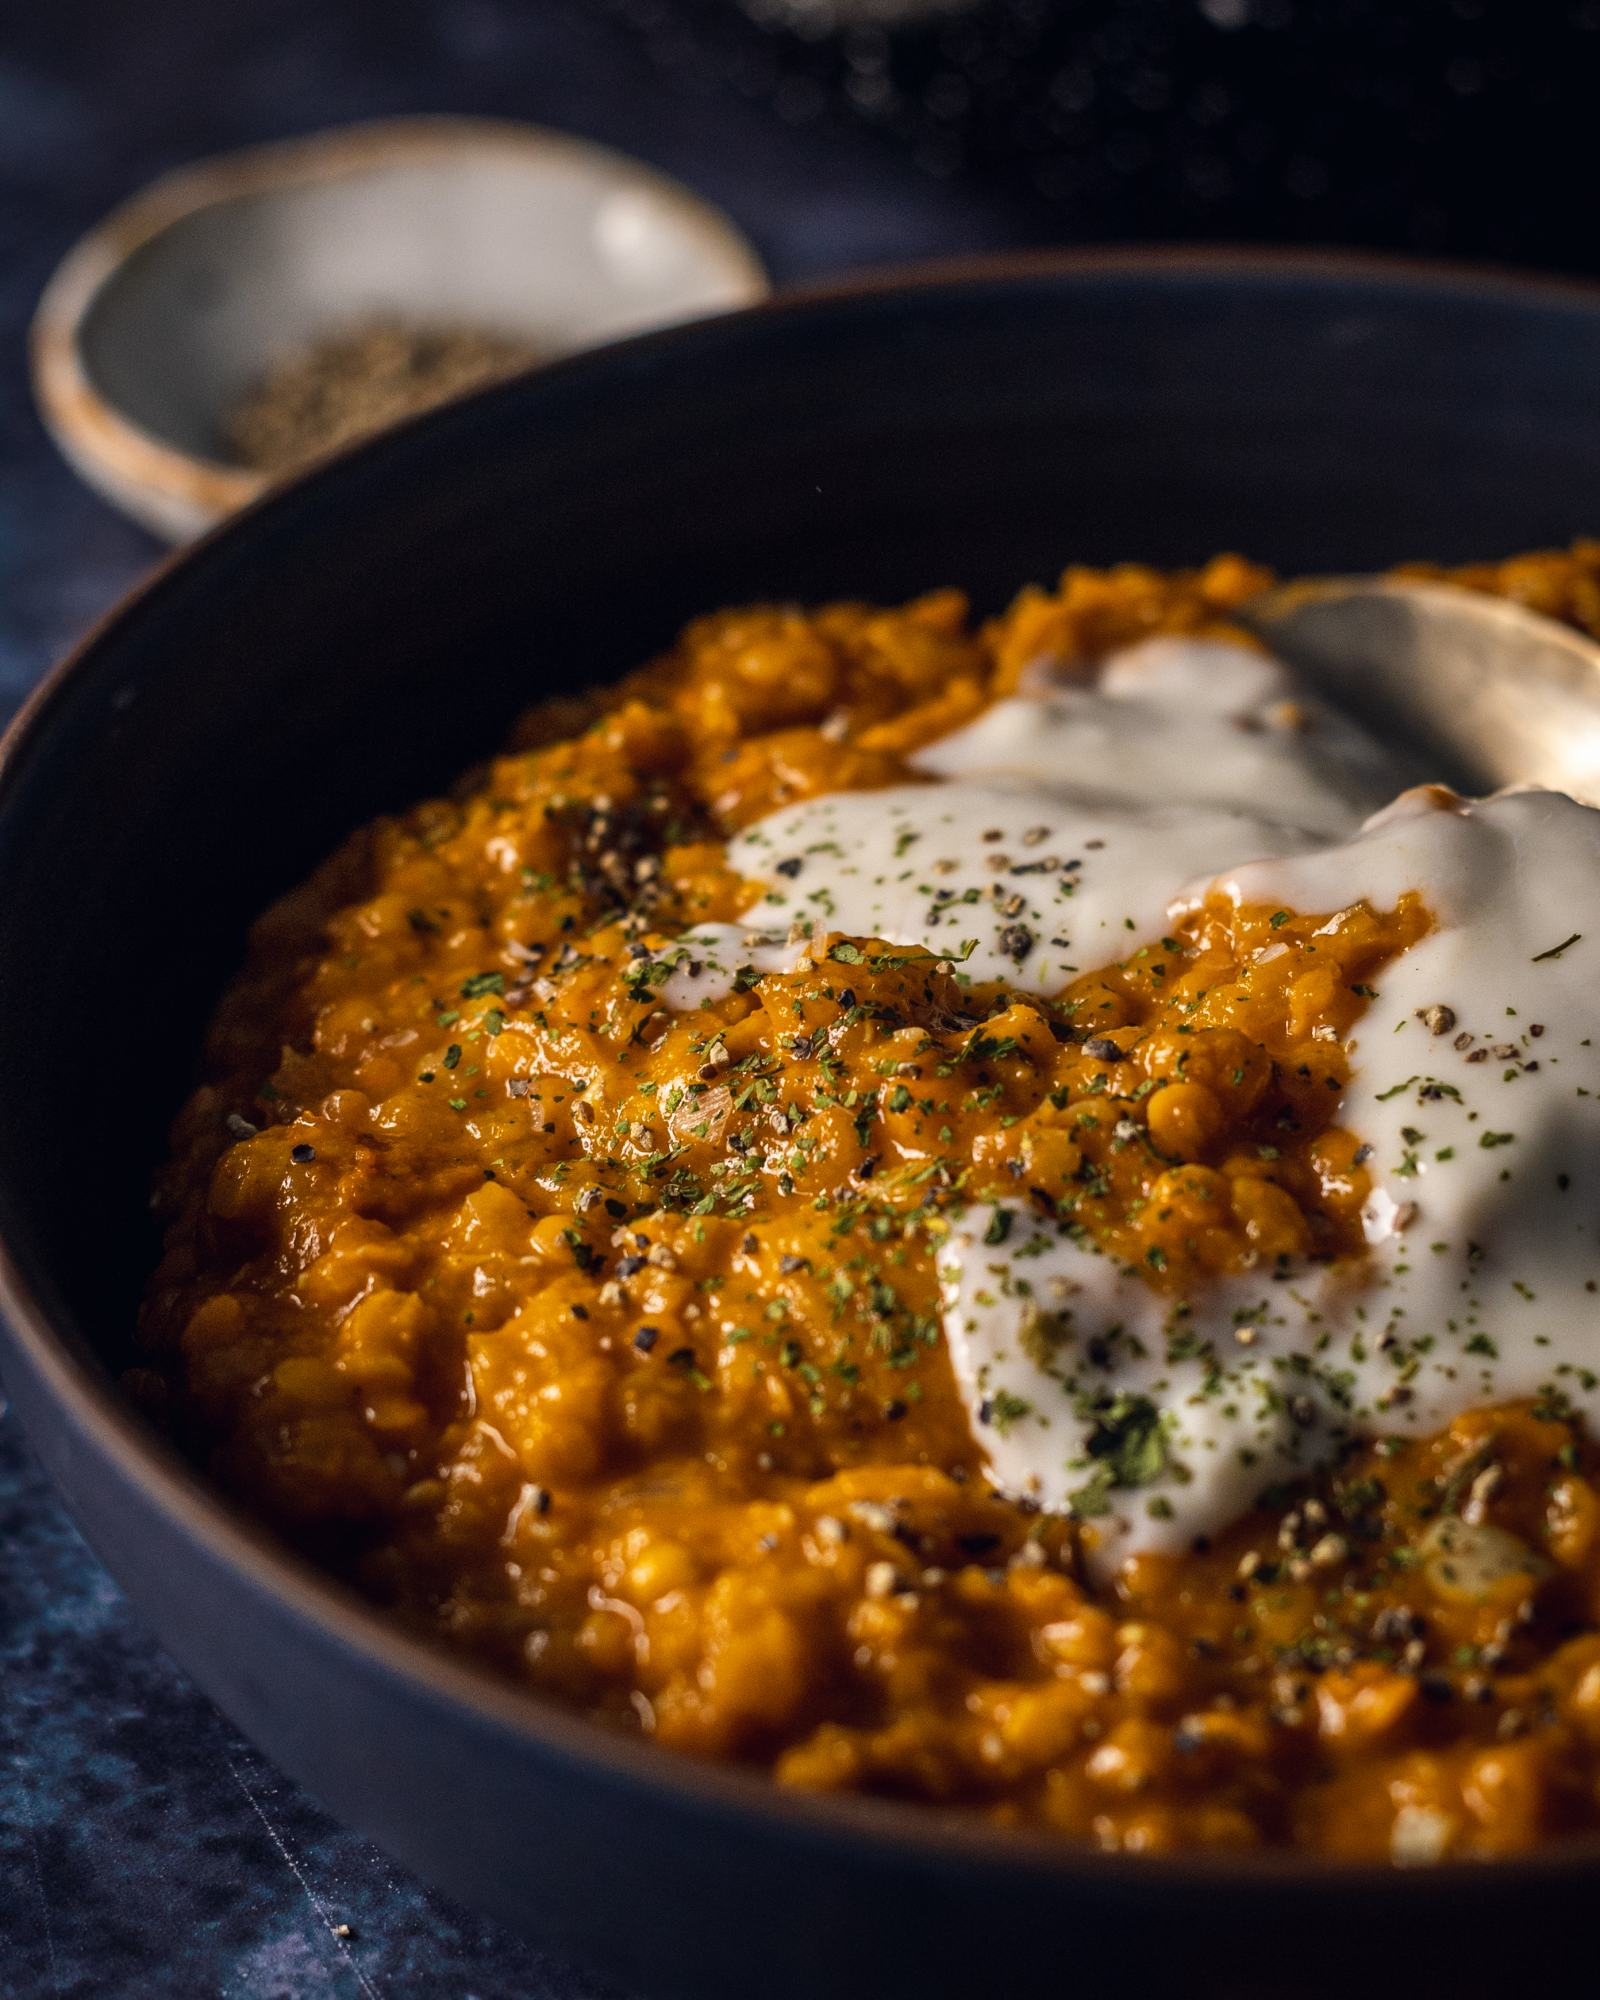 Roasted Pumpkin Red Lentil Dhal Recipe (Vegan & Gluten Free)